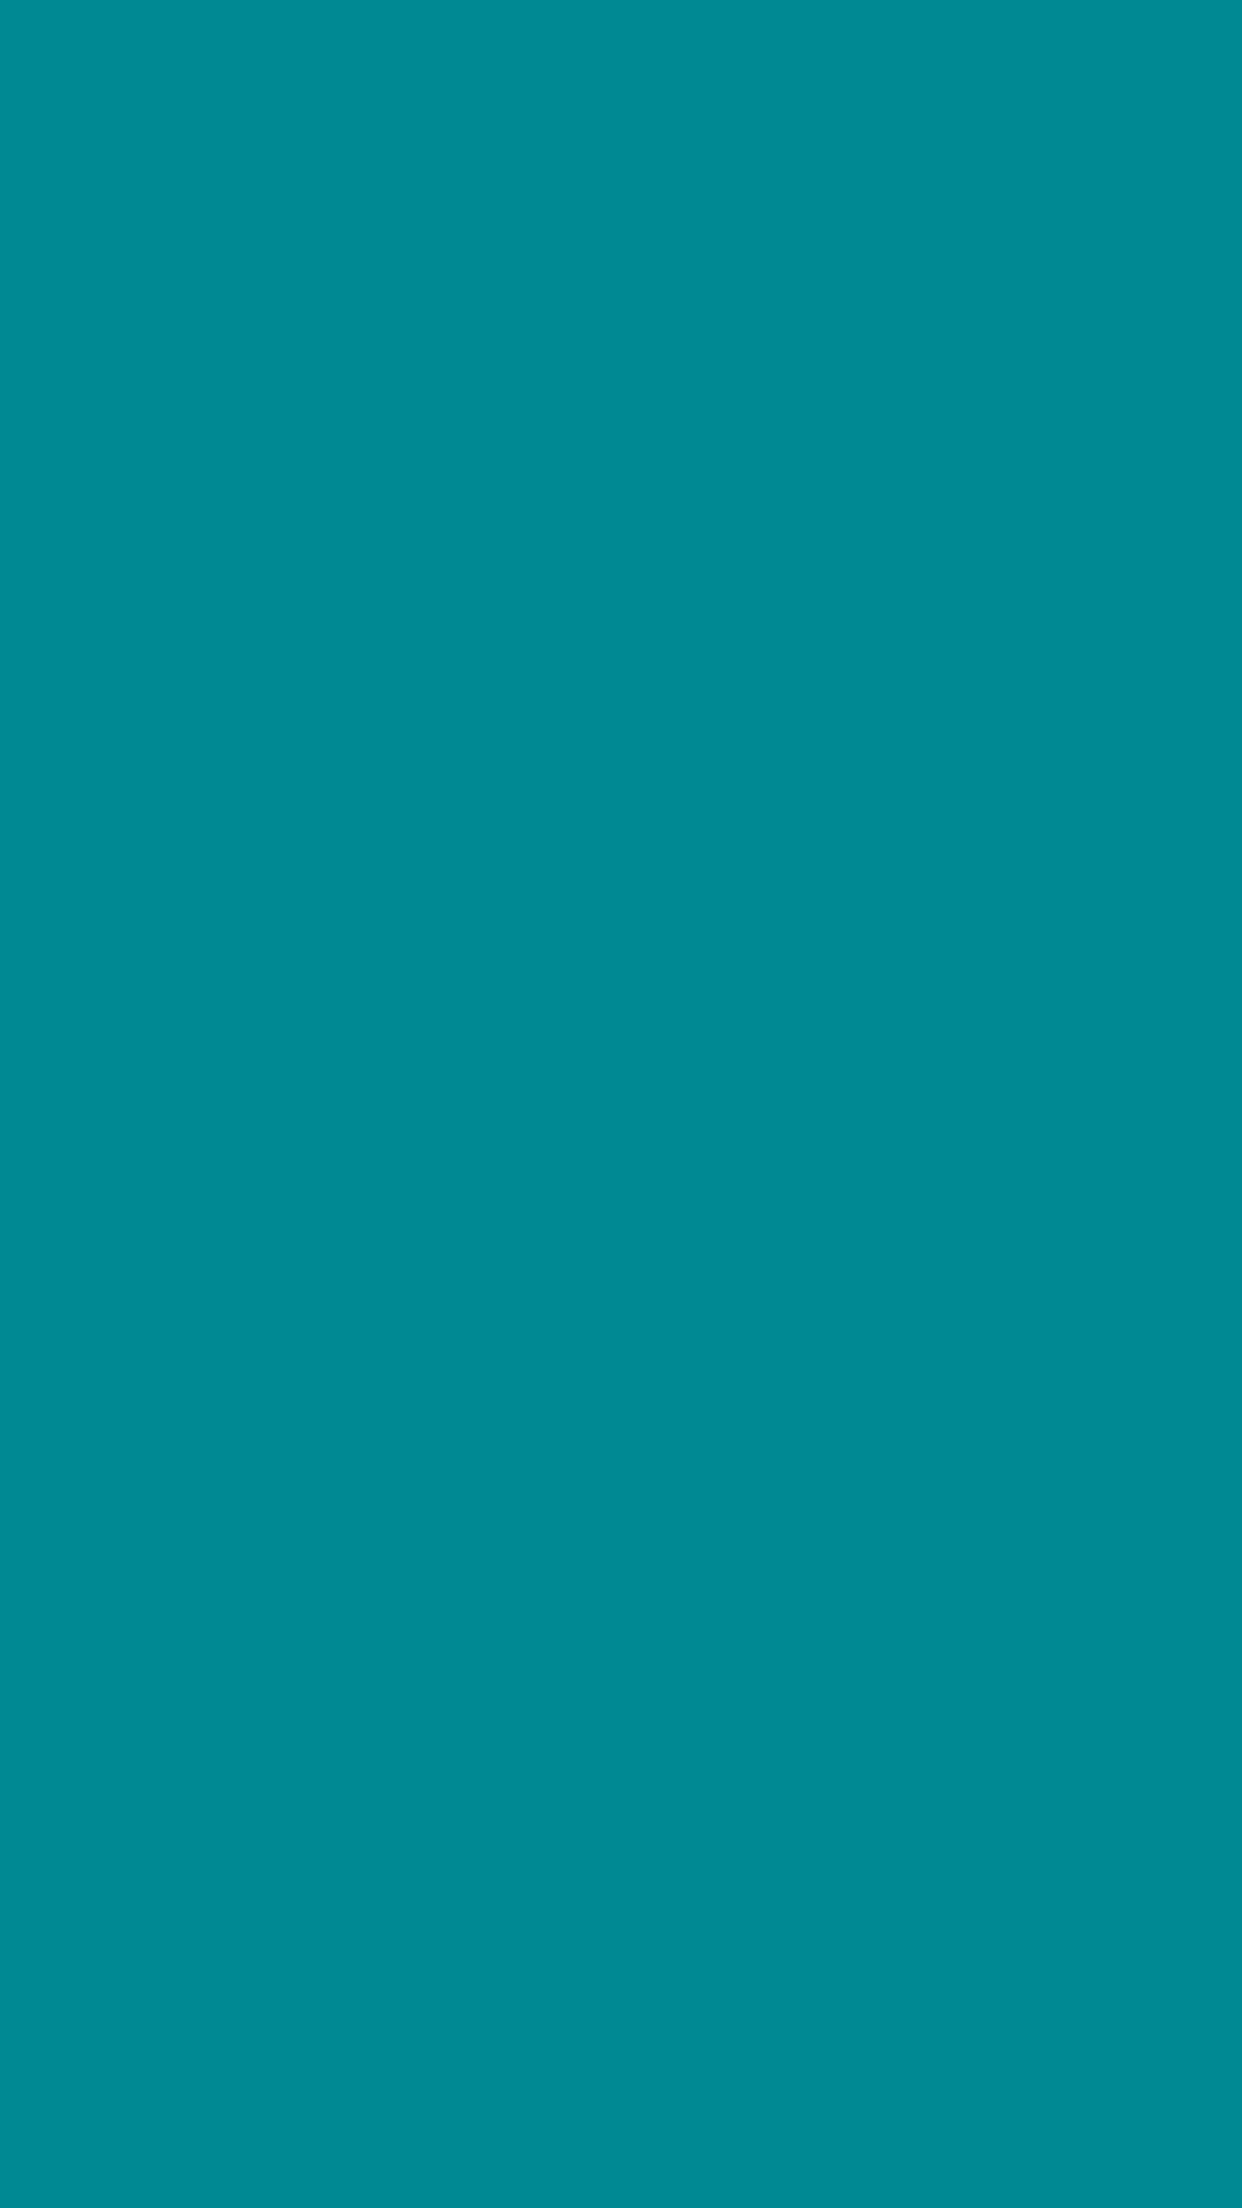 Mint Green Wallpaper Luxury Matrix Wallpapers Hd Wallpaper Green To Blue Gif 942531 Hd Wallpaper Backgrounds Download